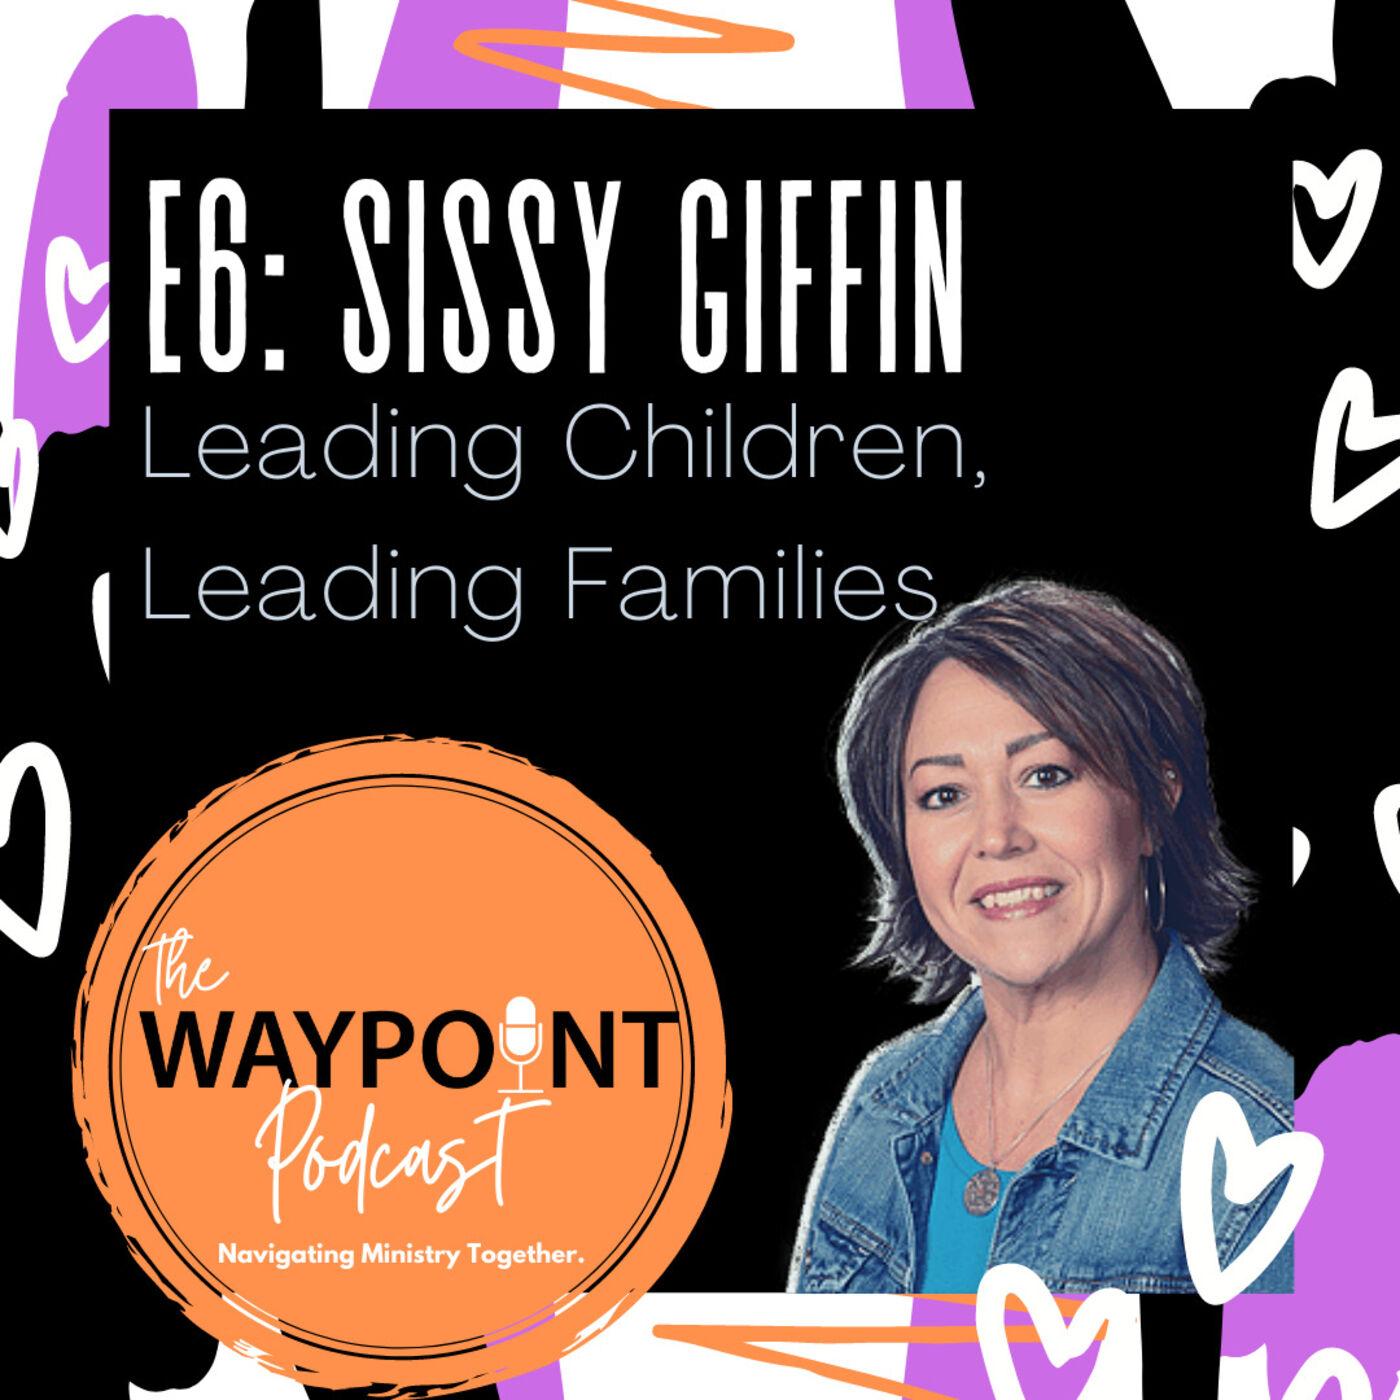 E6: Sissy Giffin | Leading Children, Leading Families